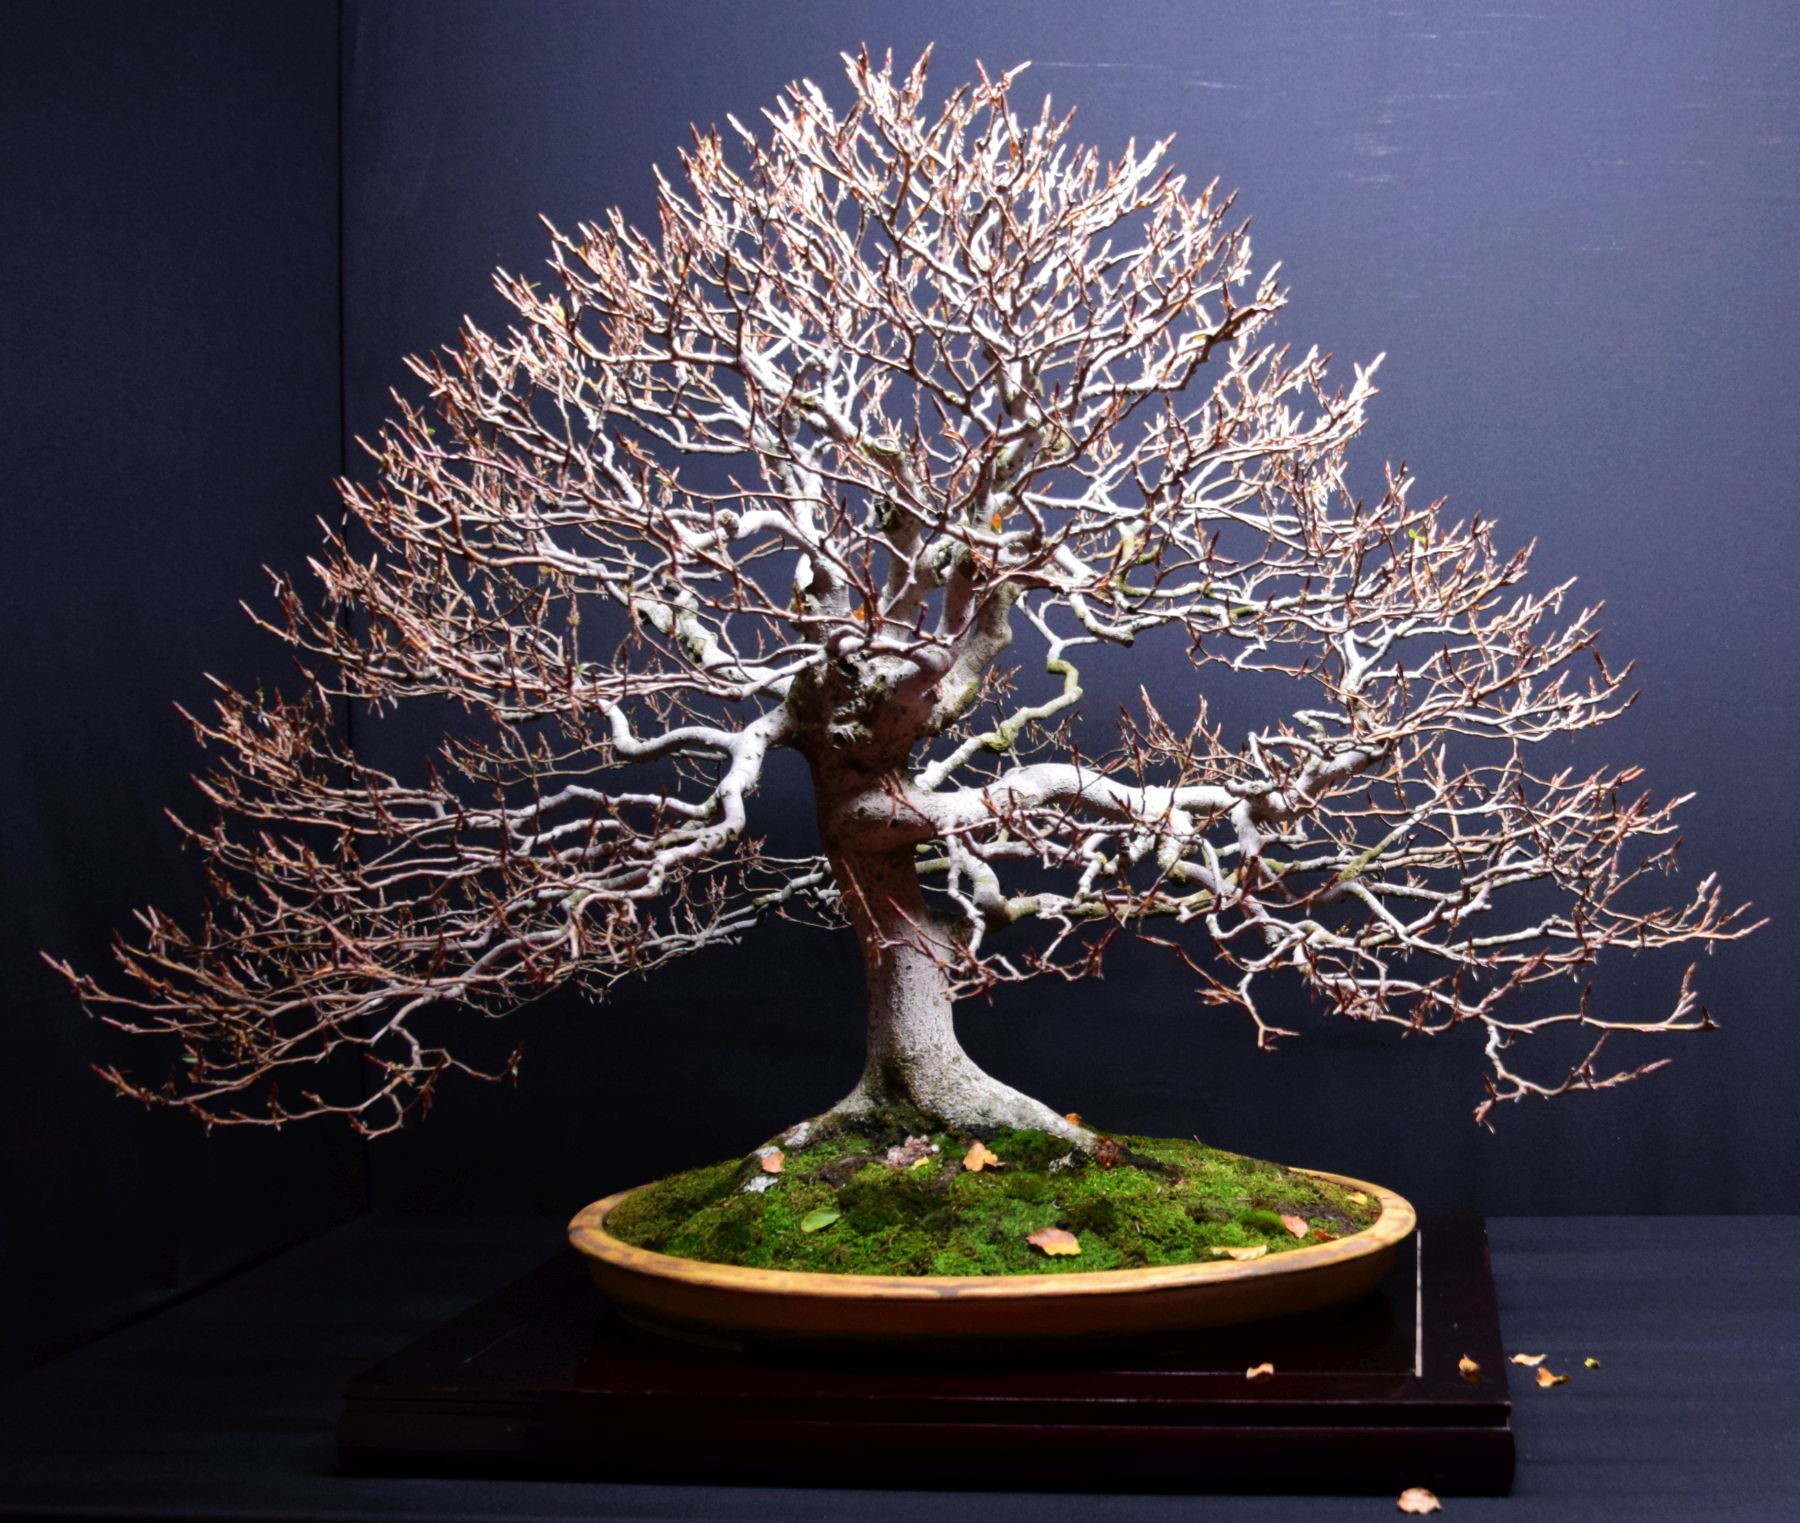 bonsai-museum-luis-vallejo-021